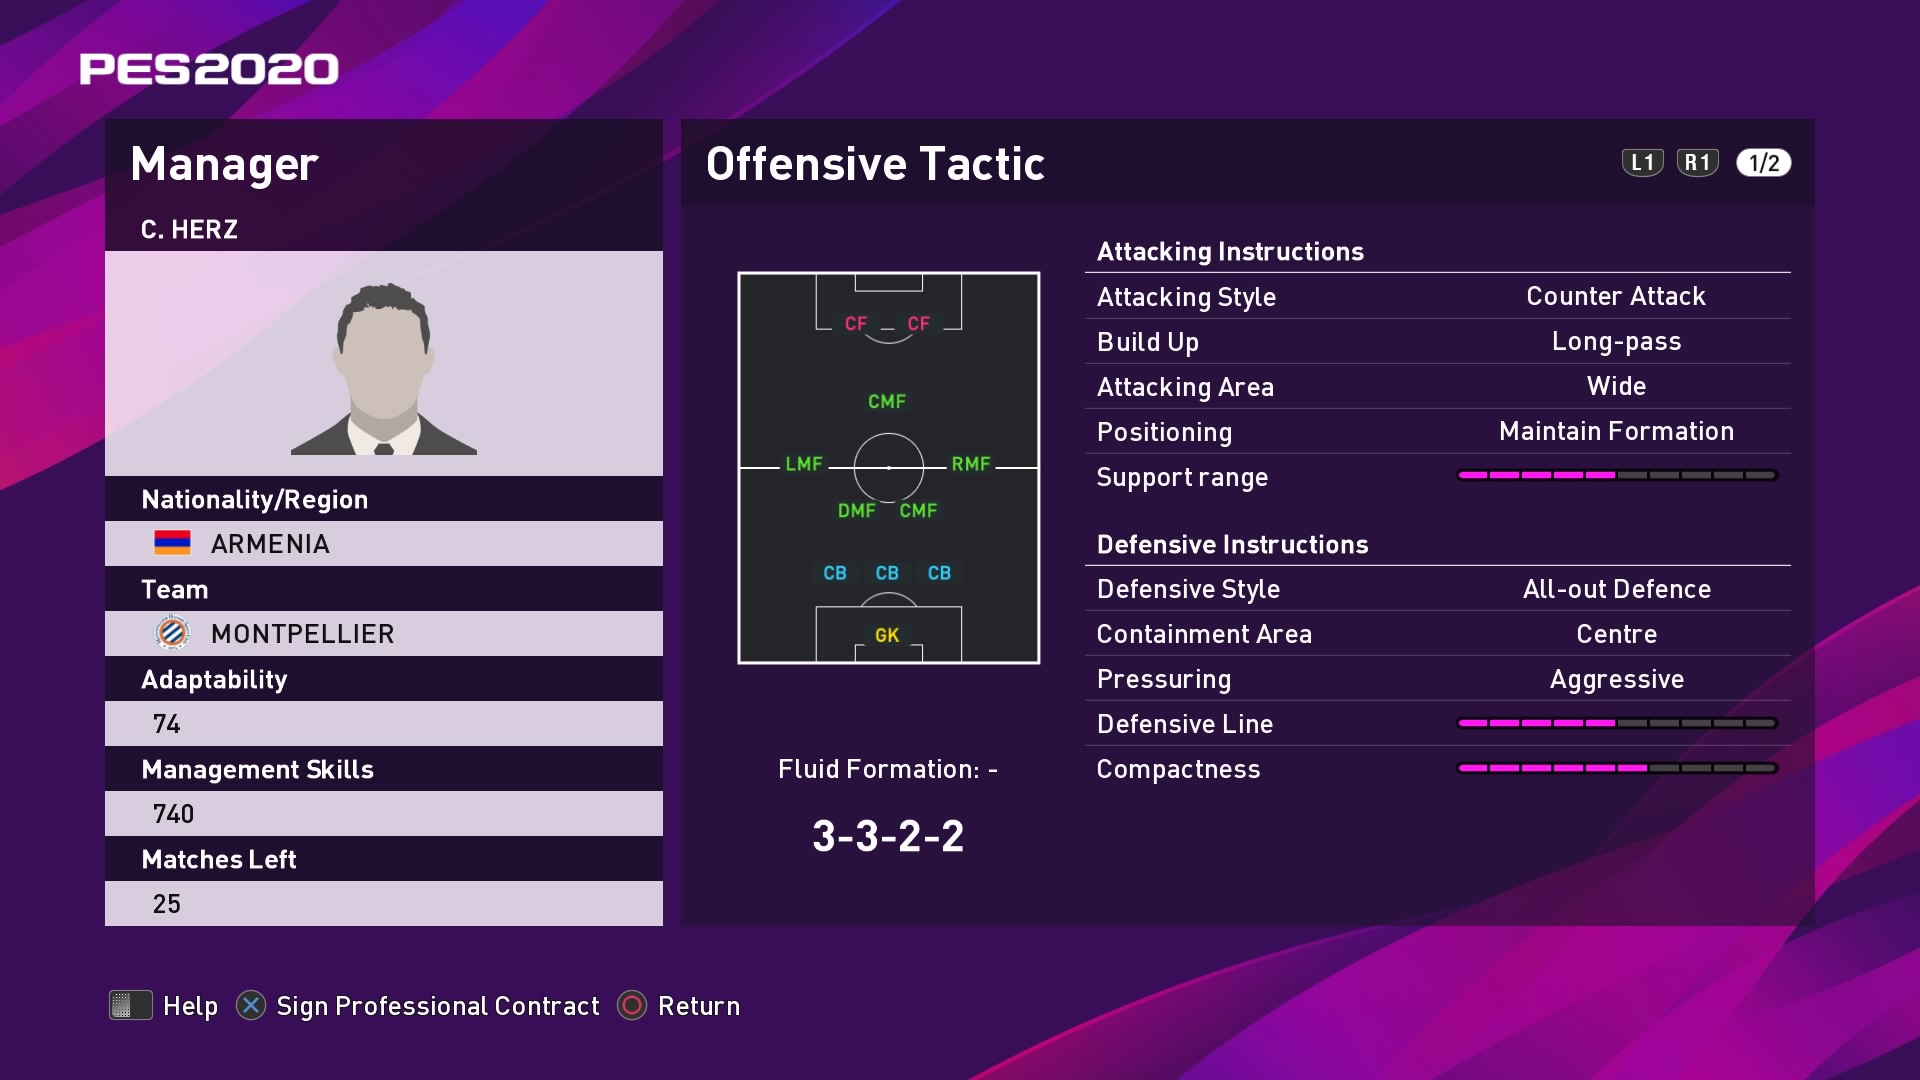 C. Herz (Michel Der Zakarian) Offensive Tactic in PES 2020 myClub